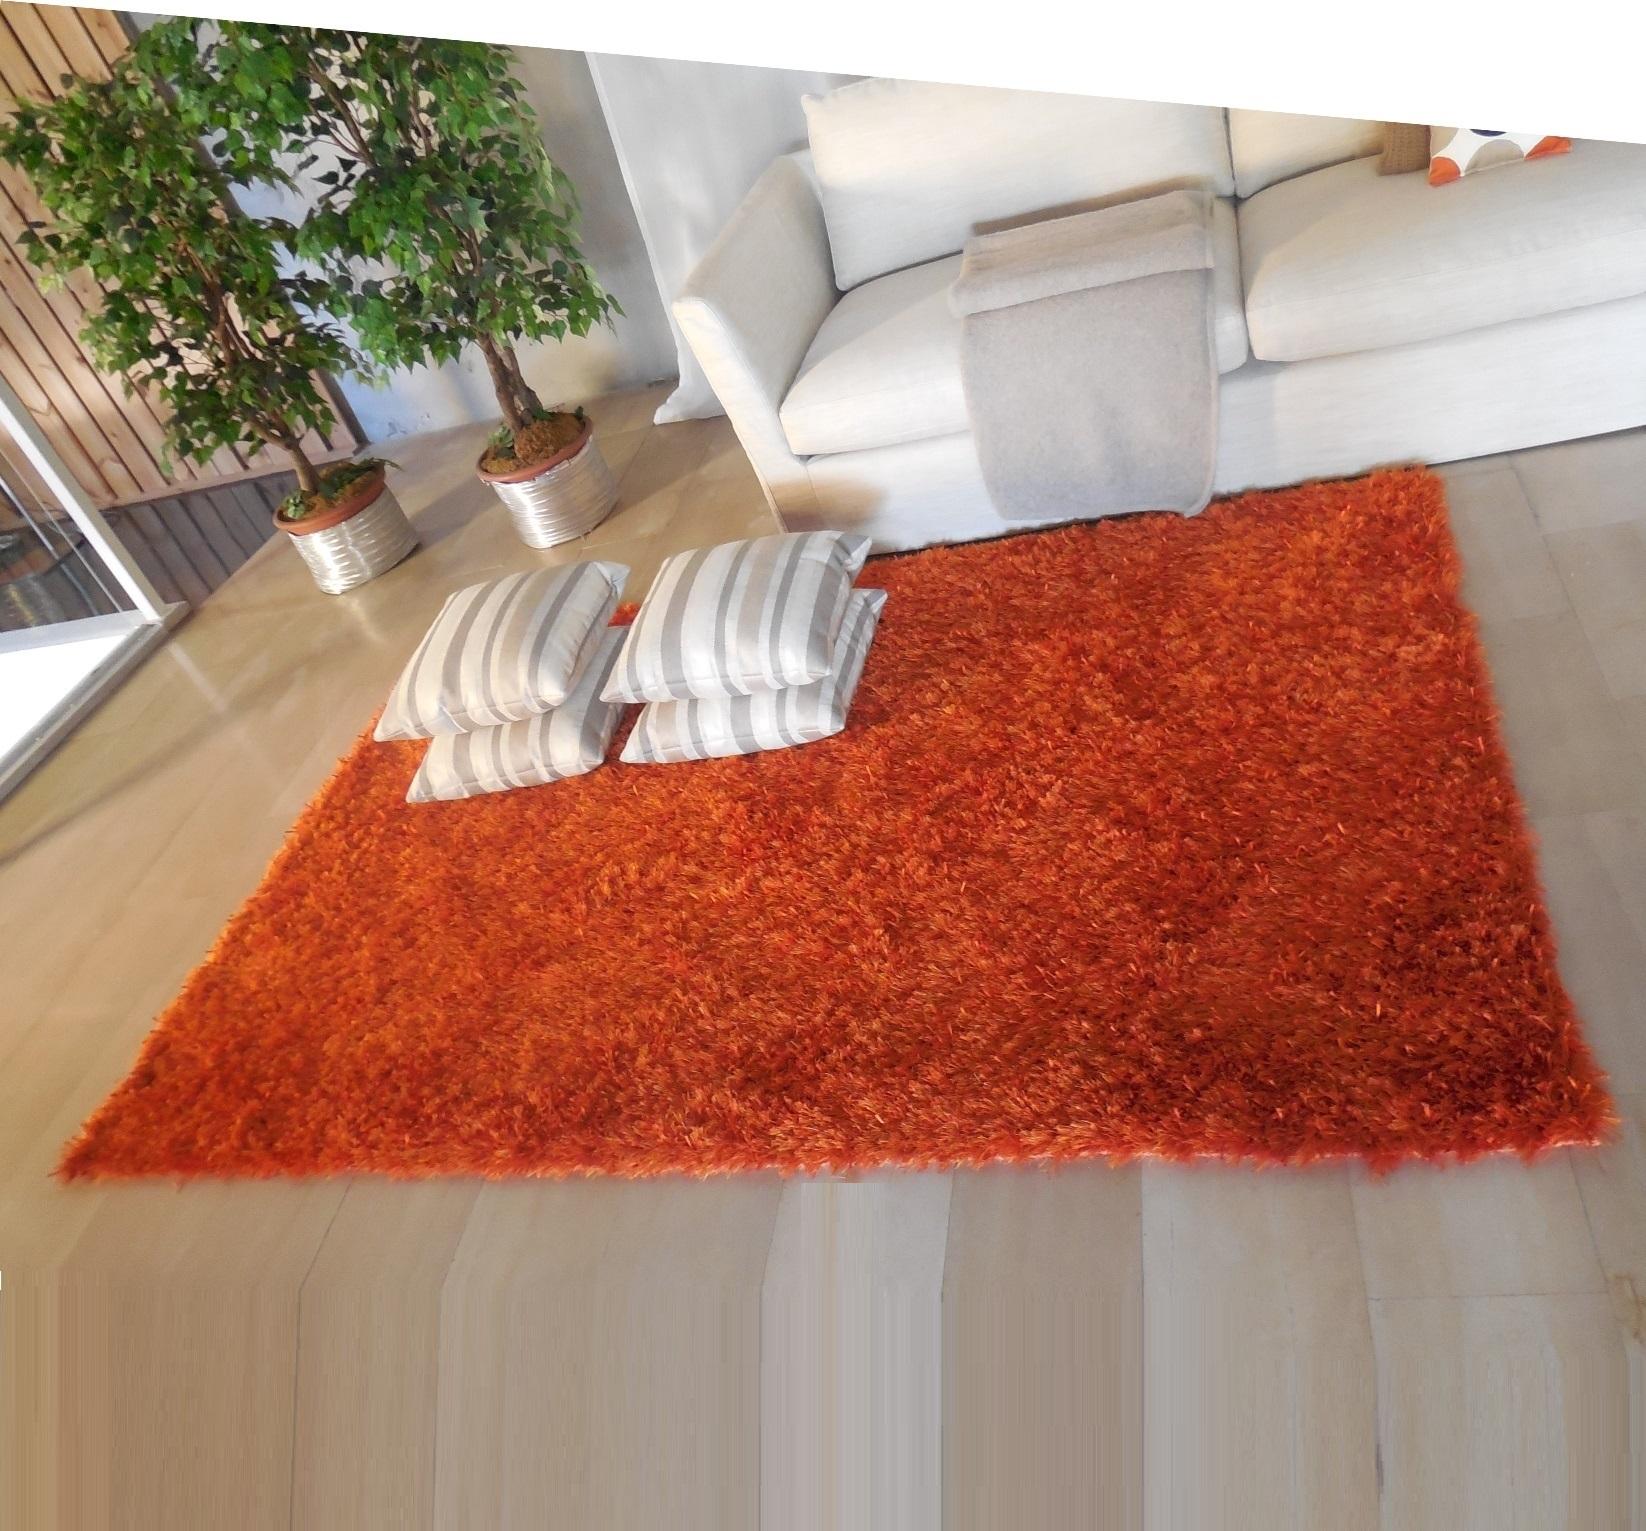 Tisca Tappeto Tisca tappeto boboli ,vendita online tappeti, carpet design shop Moderni - Tappeti ...